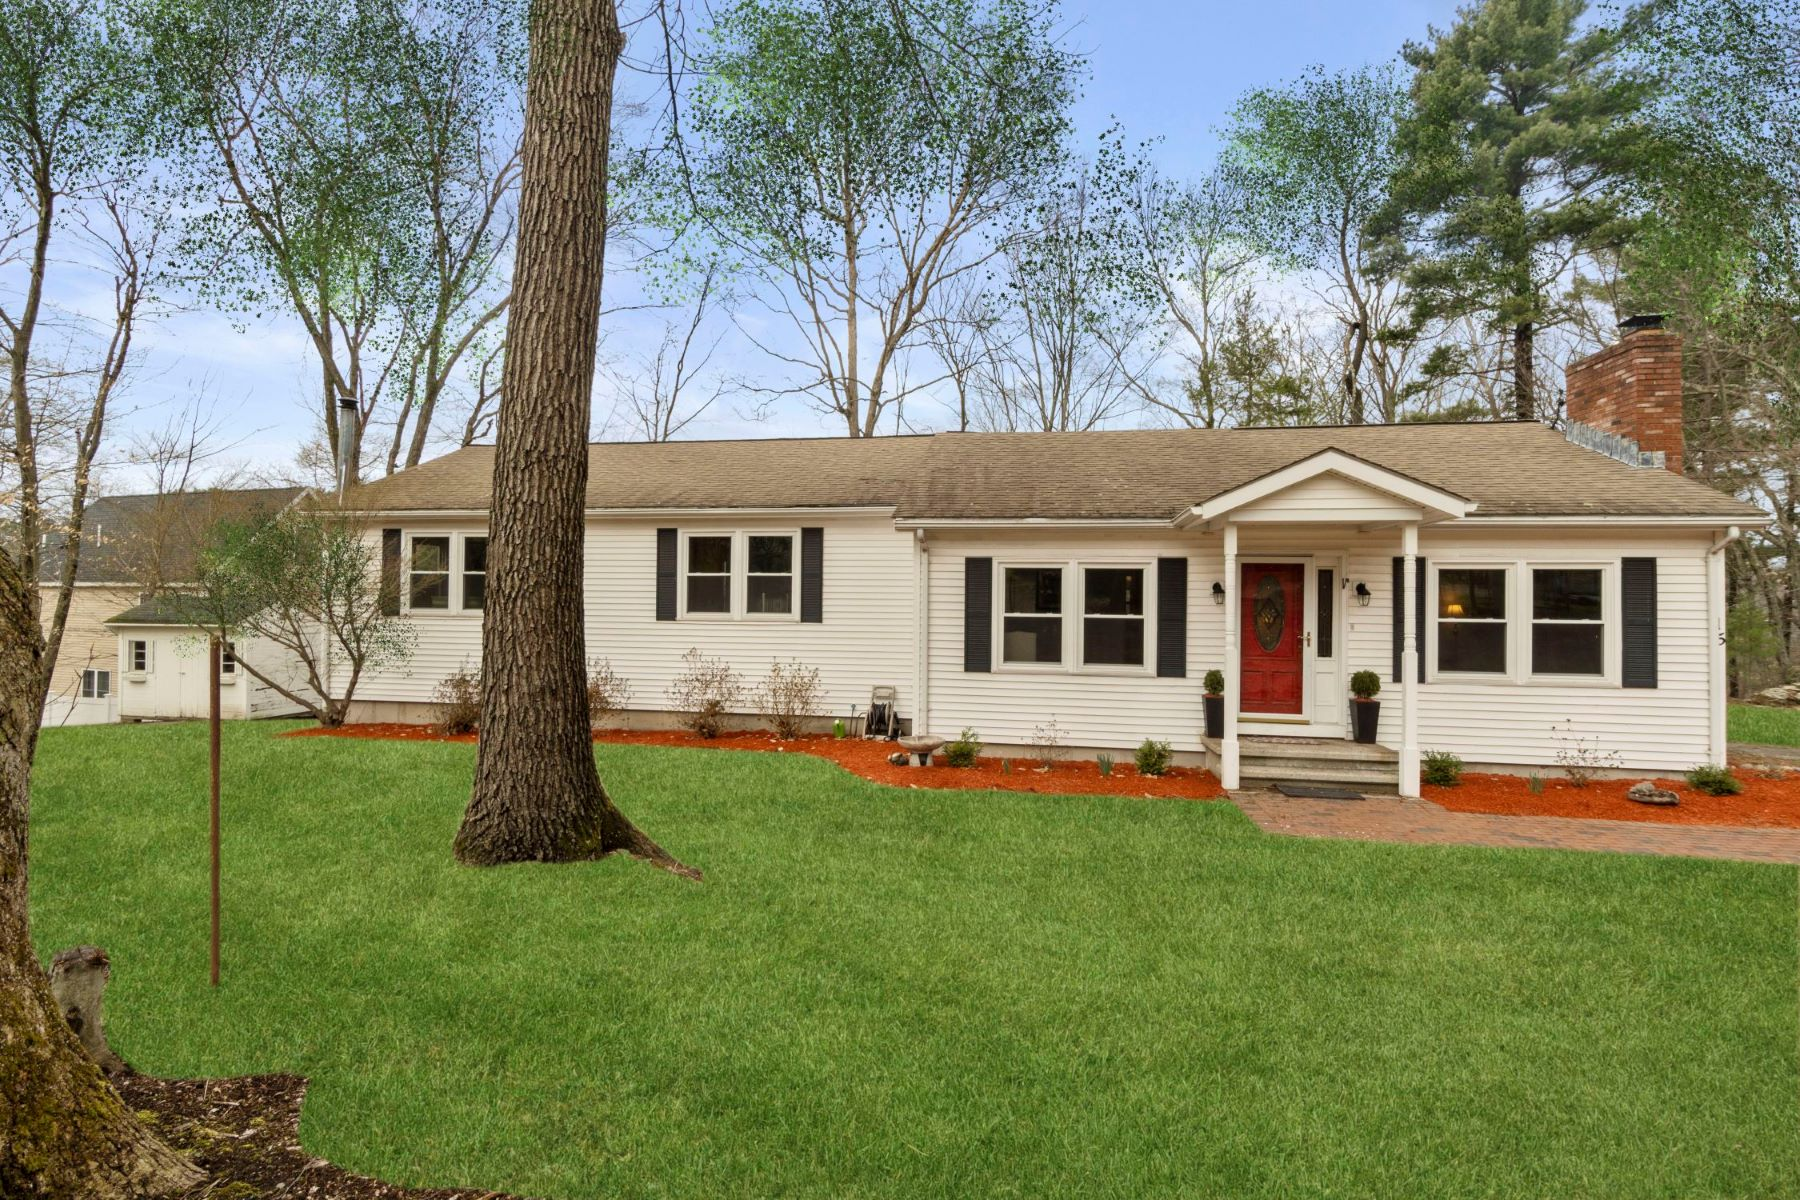 Single Family Homes για την Πώληση στο Wayland, Μασαχουσετη 01778 Ηνωμένες Πολιτείες